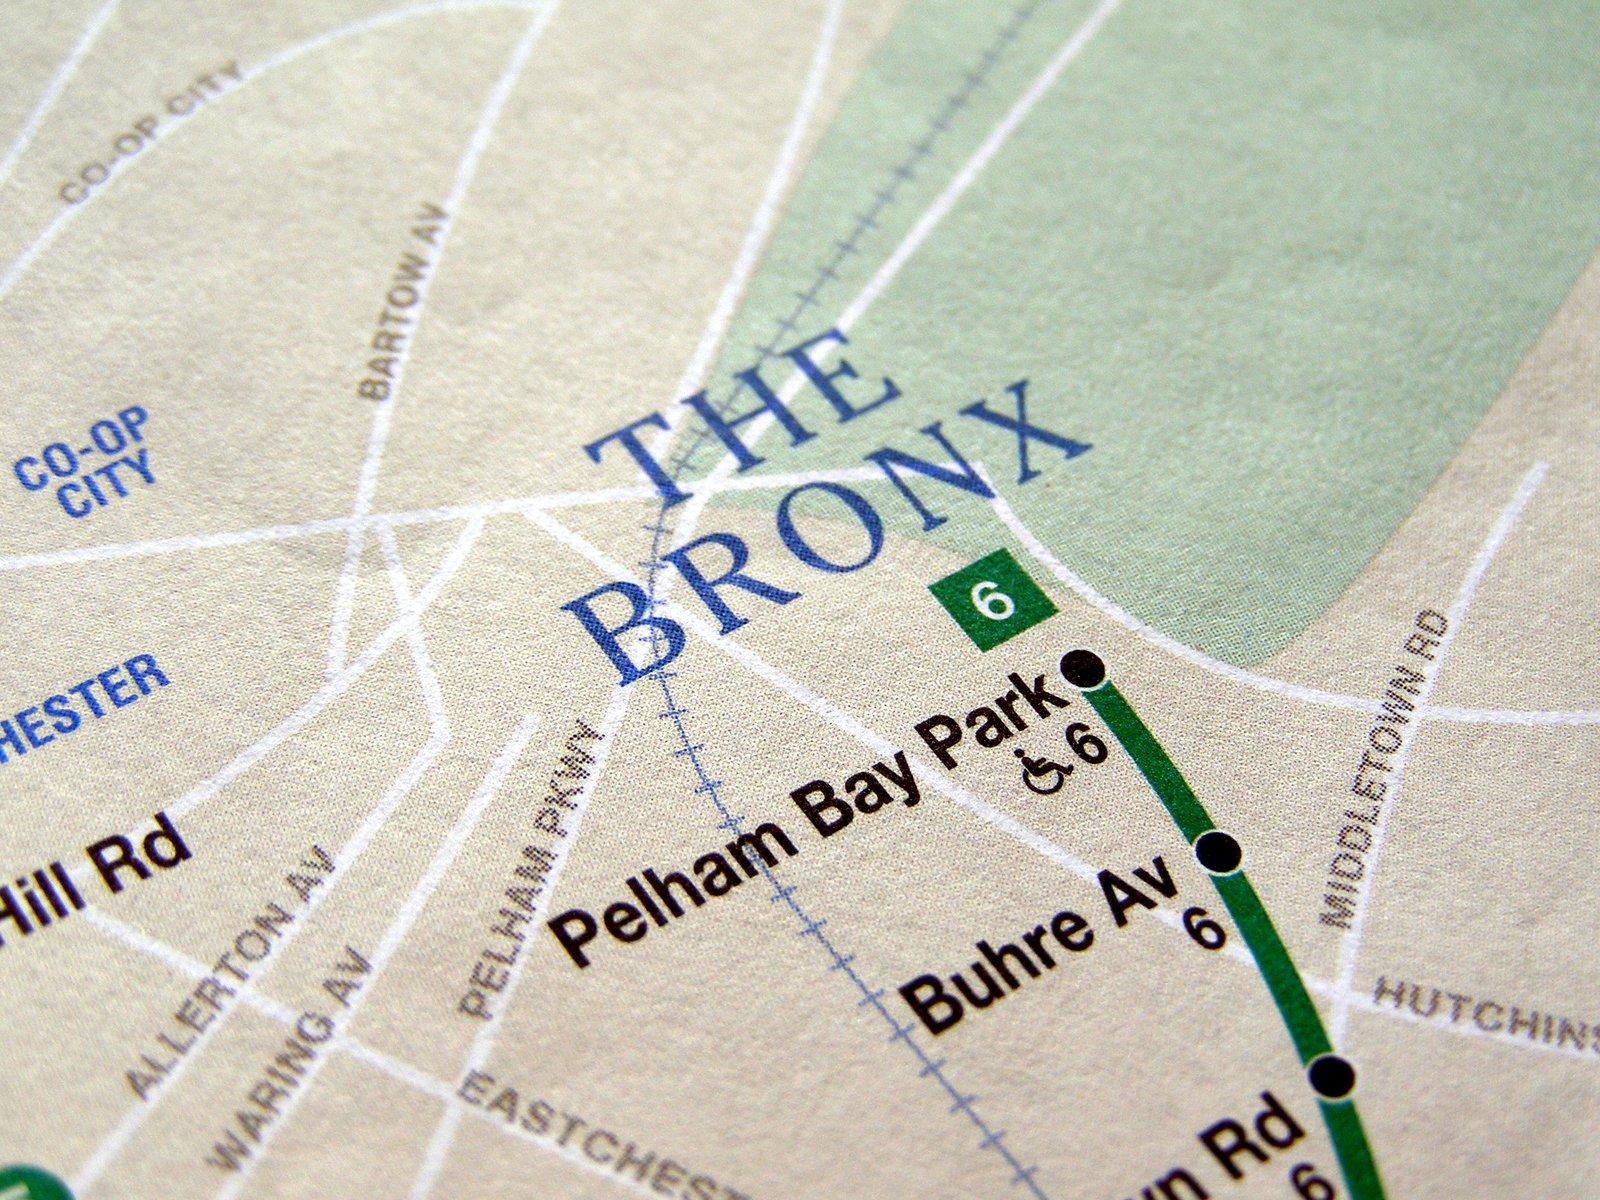 Mott Haven Bronx, NY Private Investigator